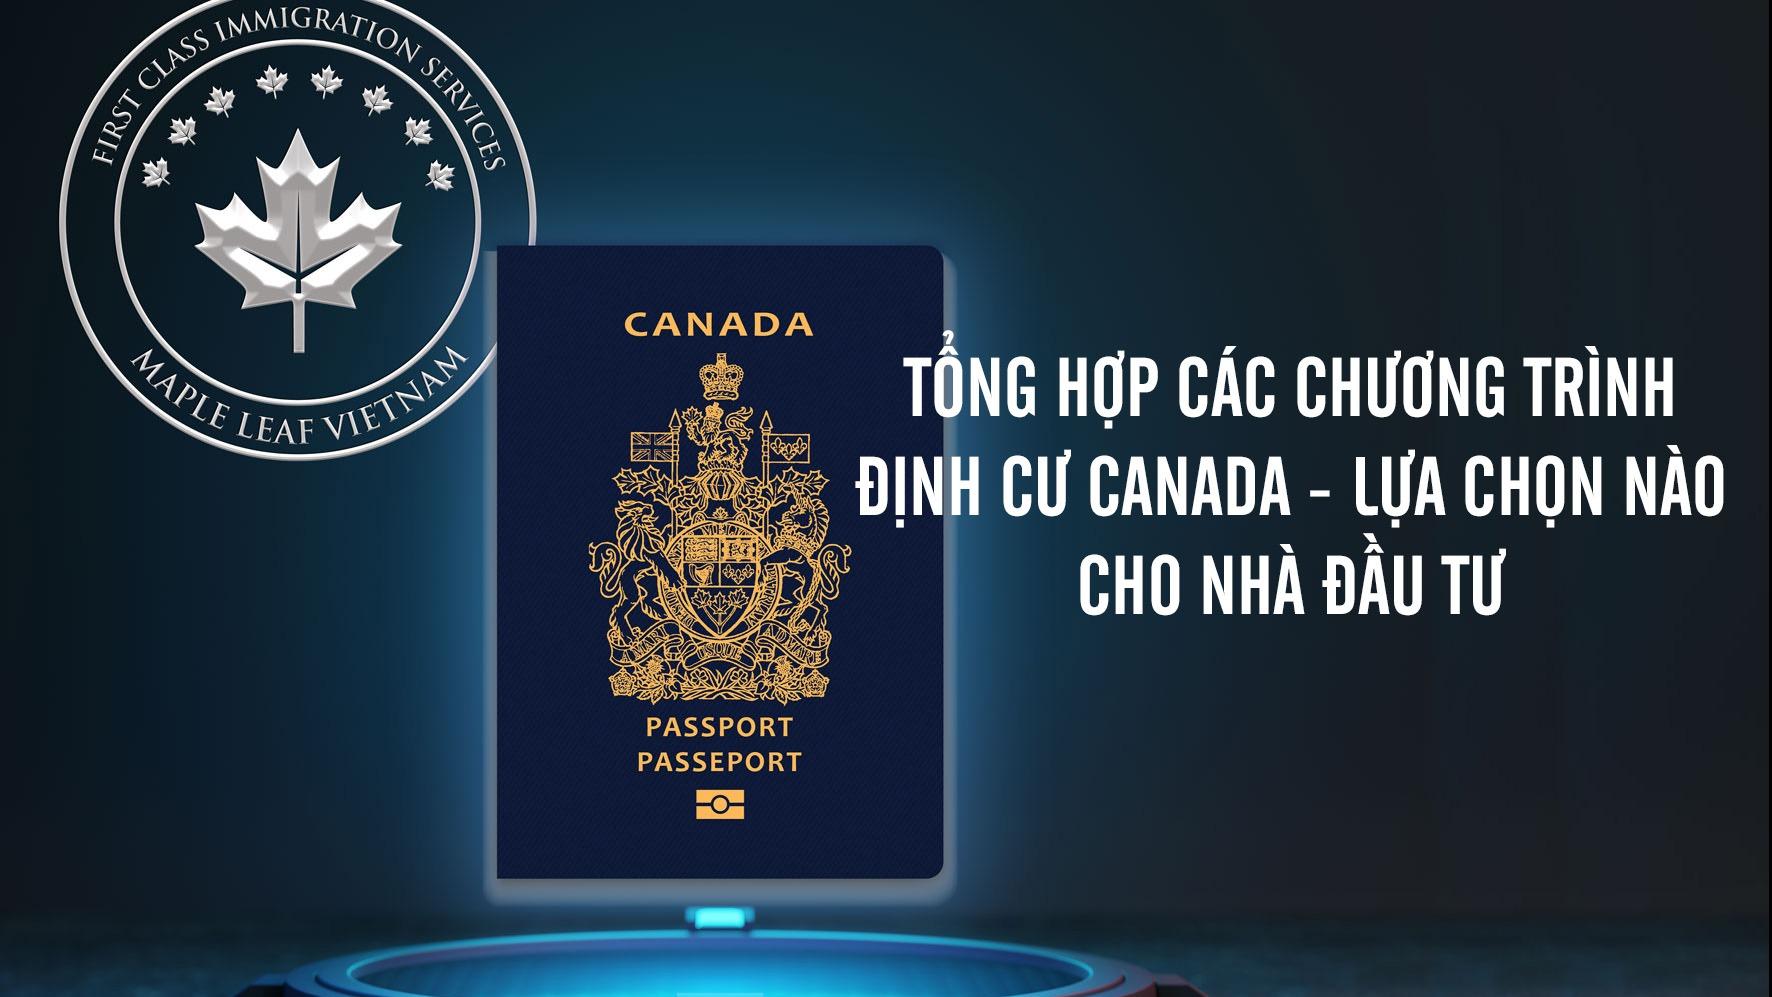 tong-hop-cac-chuong-trinh-dinh-cu-canada---lua-chon-nao-cho-nha-dau-tu